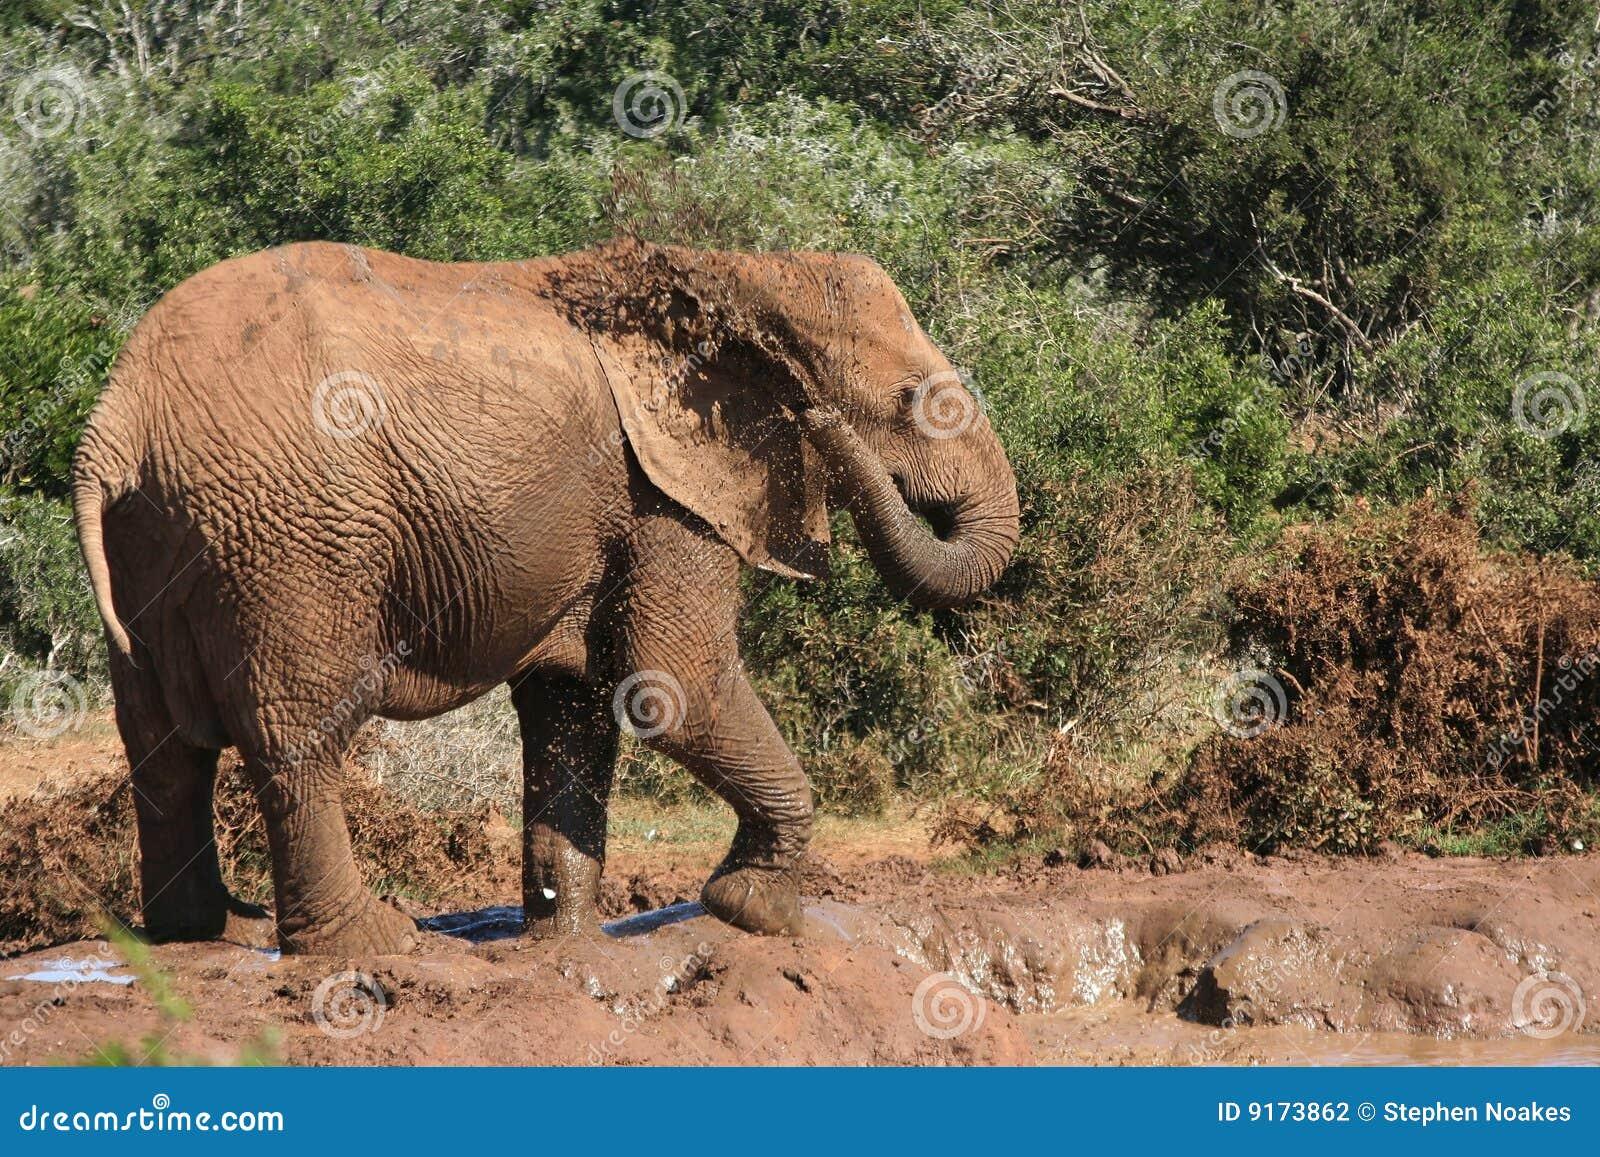 Elephant spraying water - photo#23